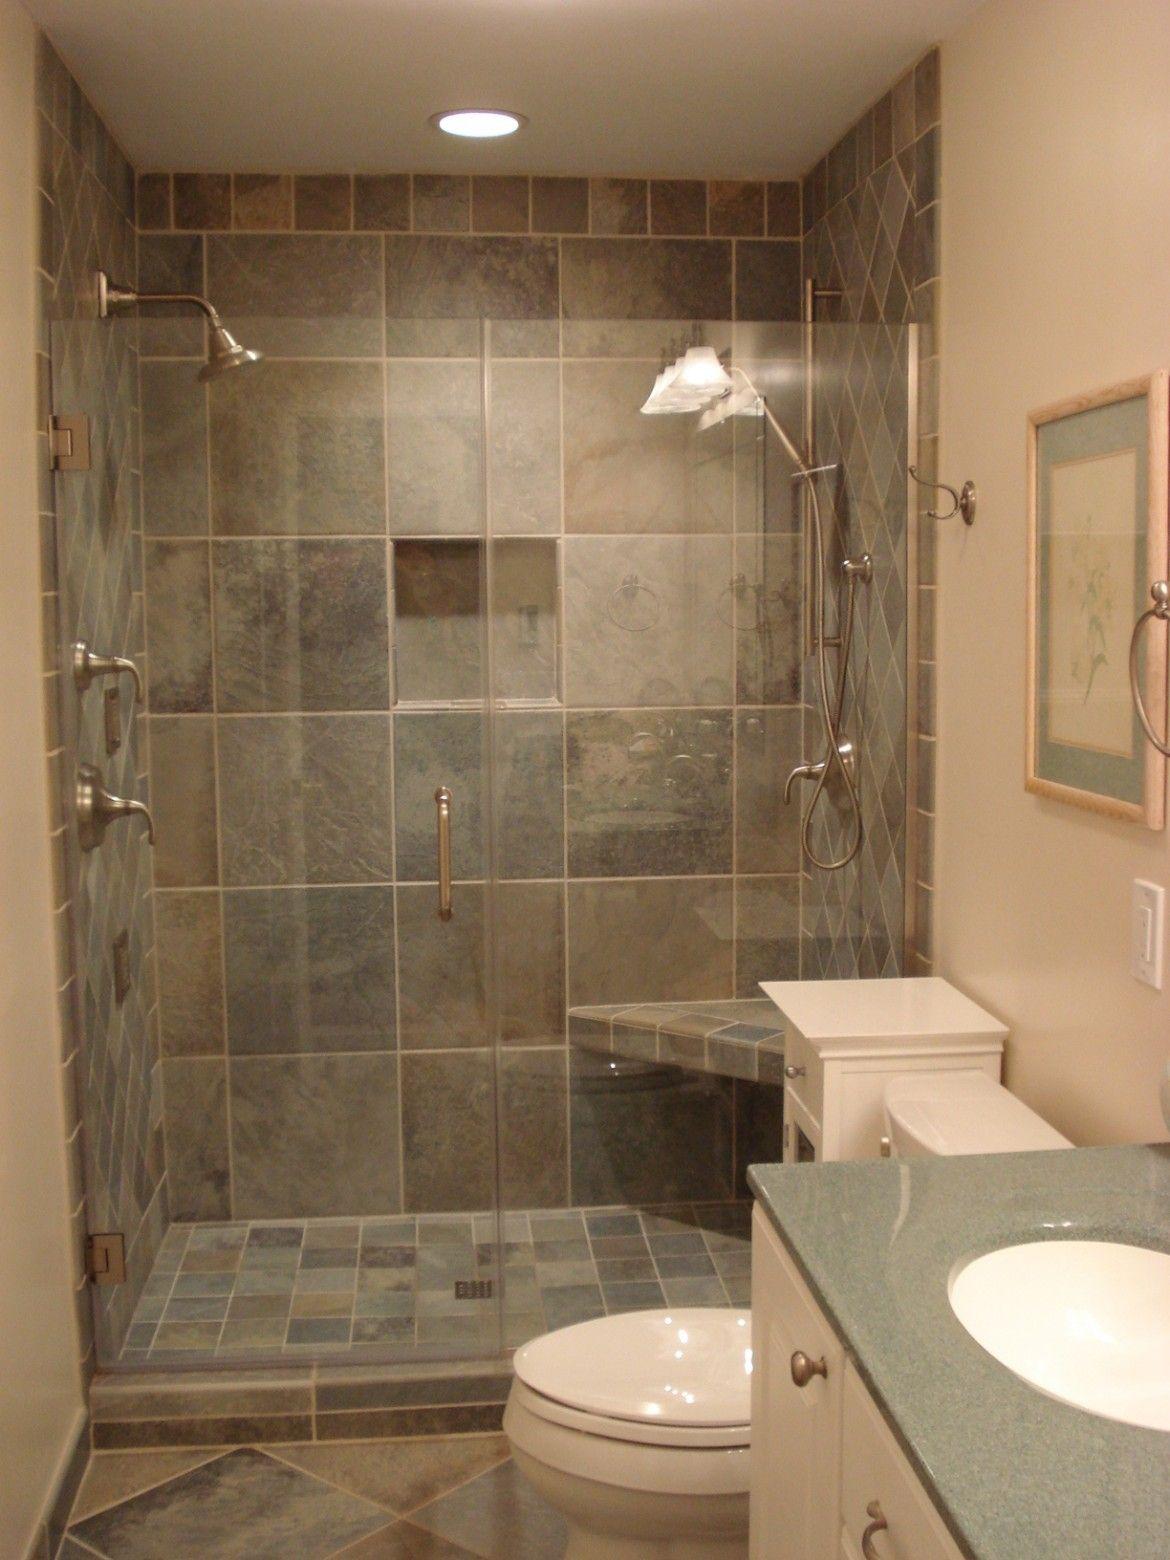 Like The Shower Seat Architecturedesignssmallcountrybathroom Alluring Small Country Bathroom Design Inspiration